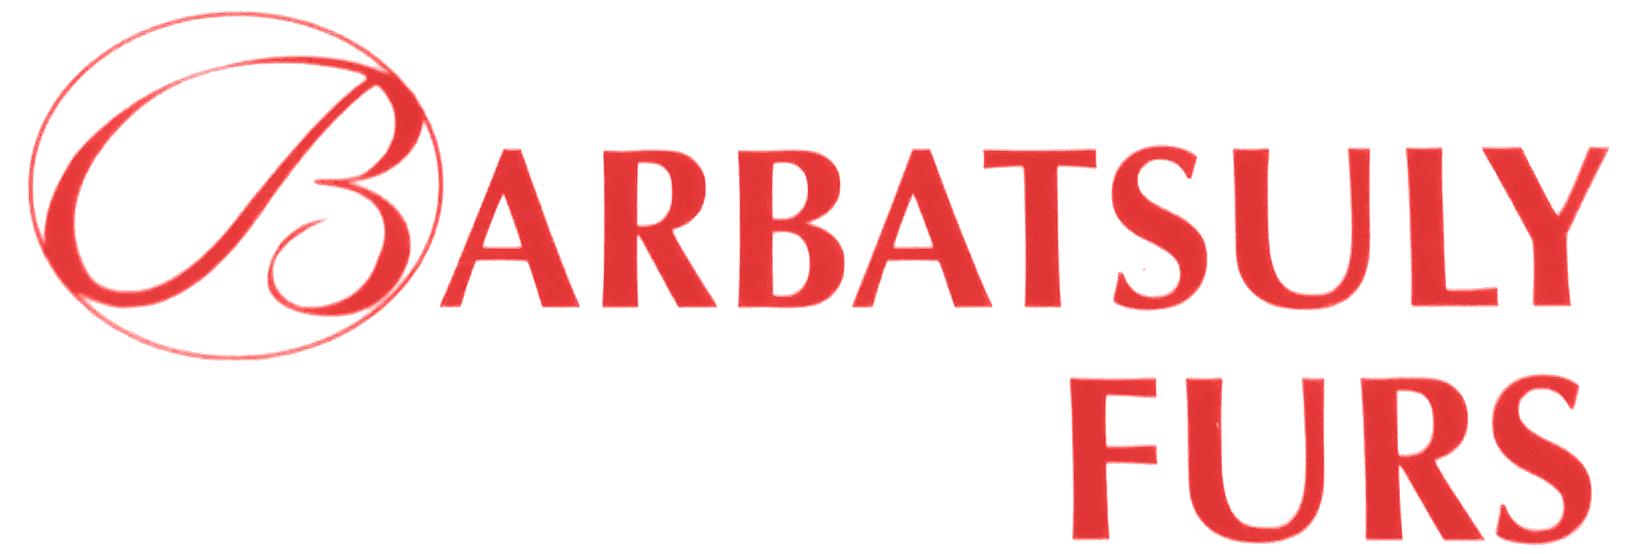 Barbatsuly Furs - logo